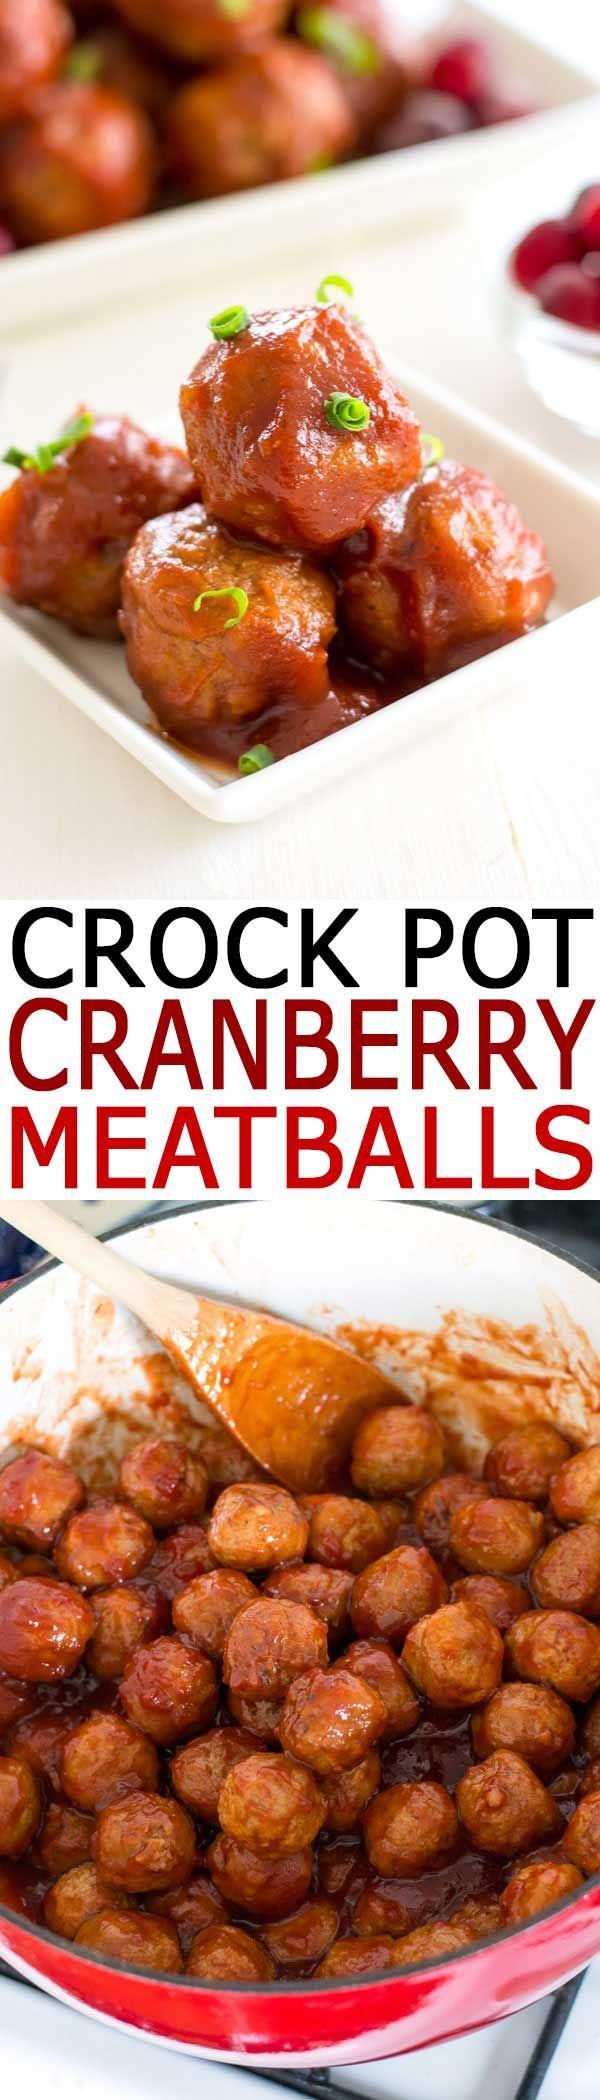 Crock Pot Cranberry Meatballs | Easy 3-ingredient appetizer recipe! #appetizers #holidayrecipes #slowcooker